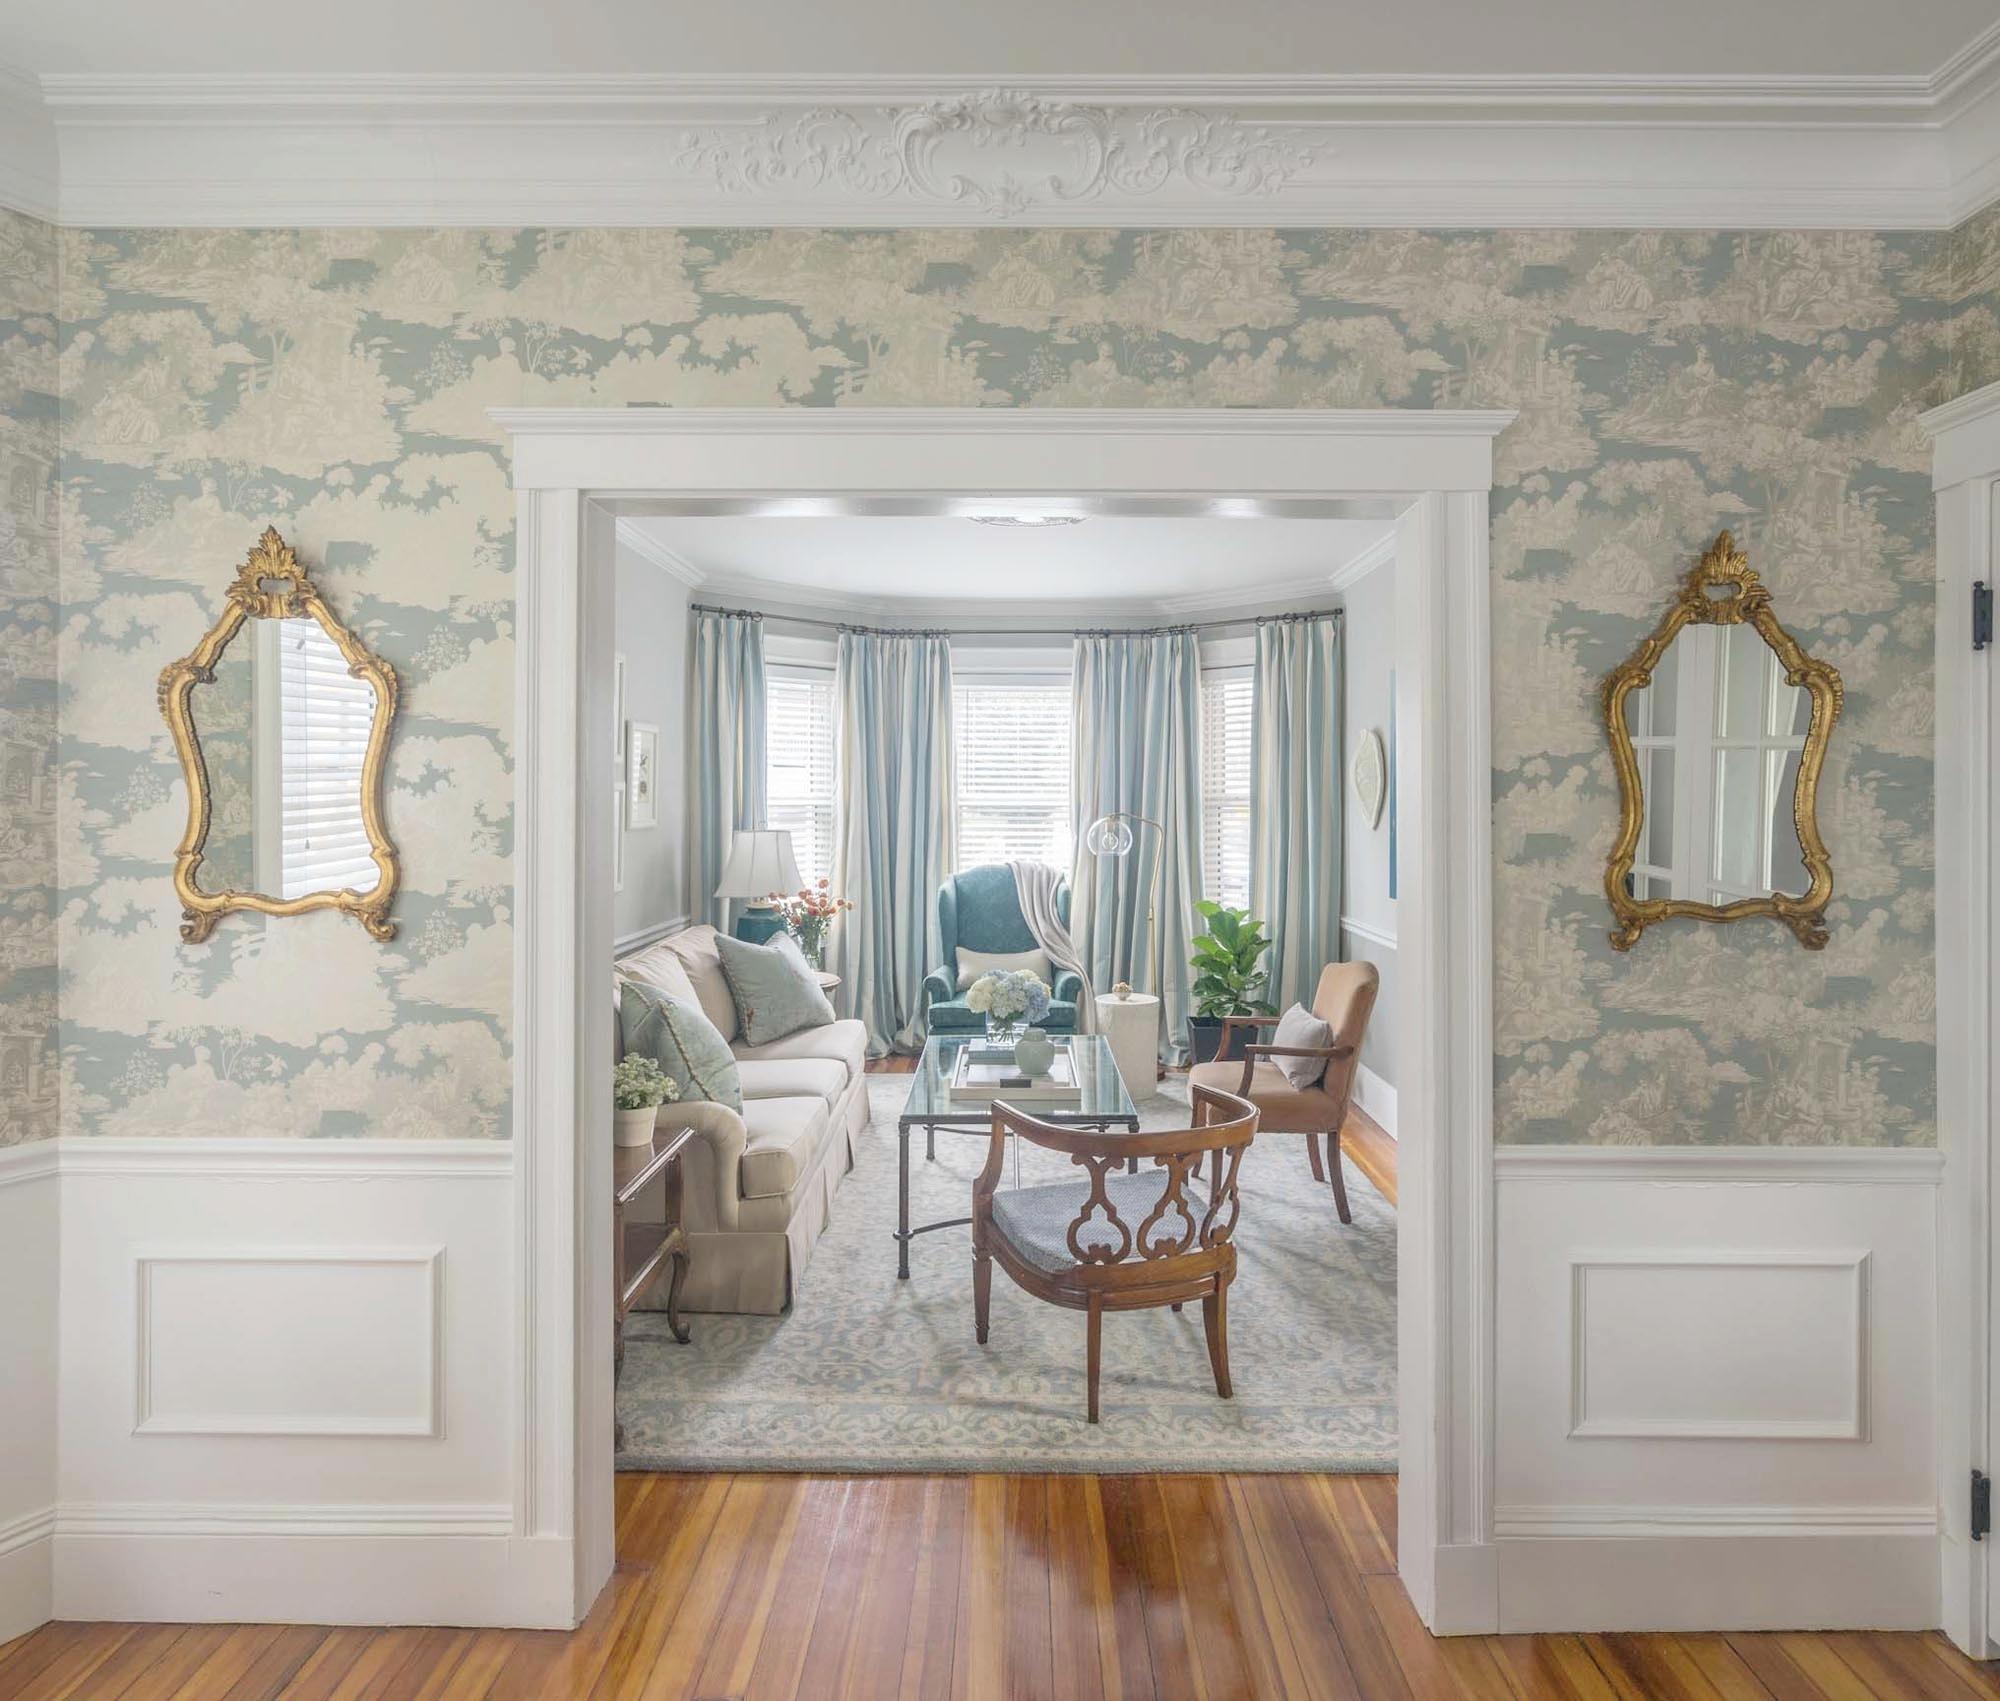 Boston entry interior design by Dane Austin Design